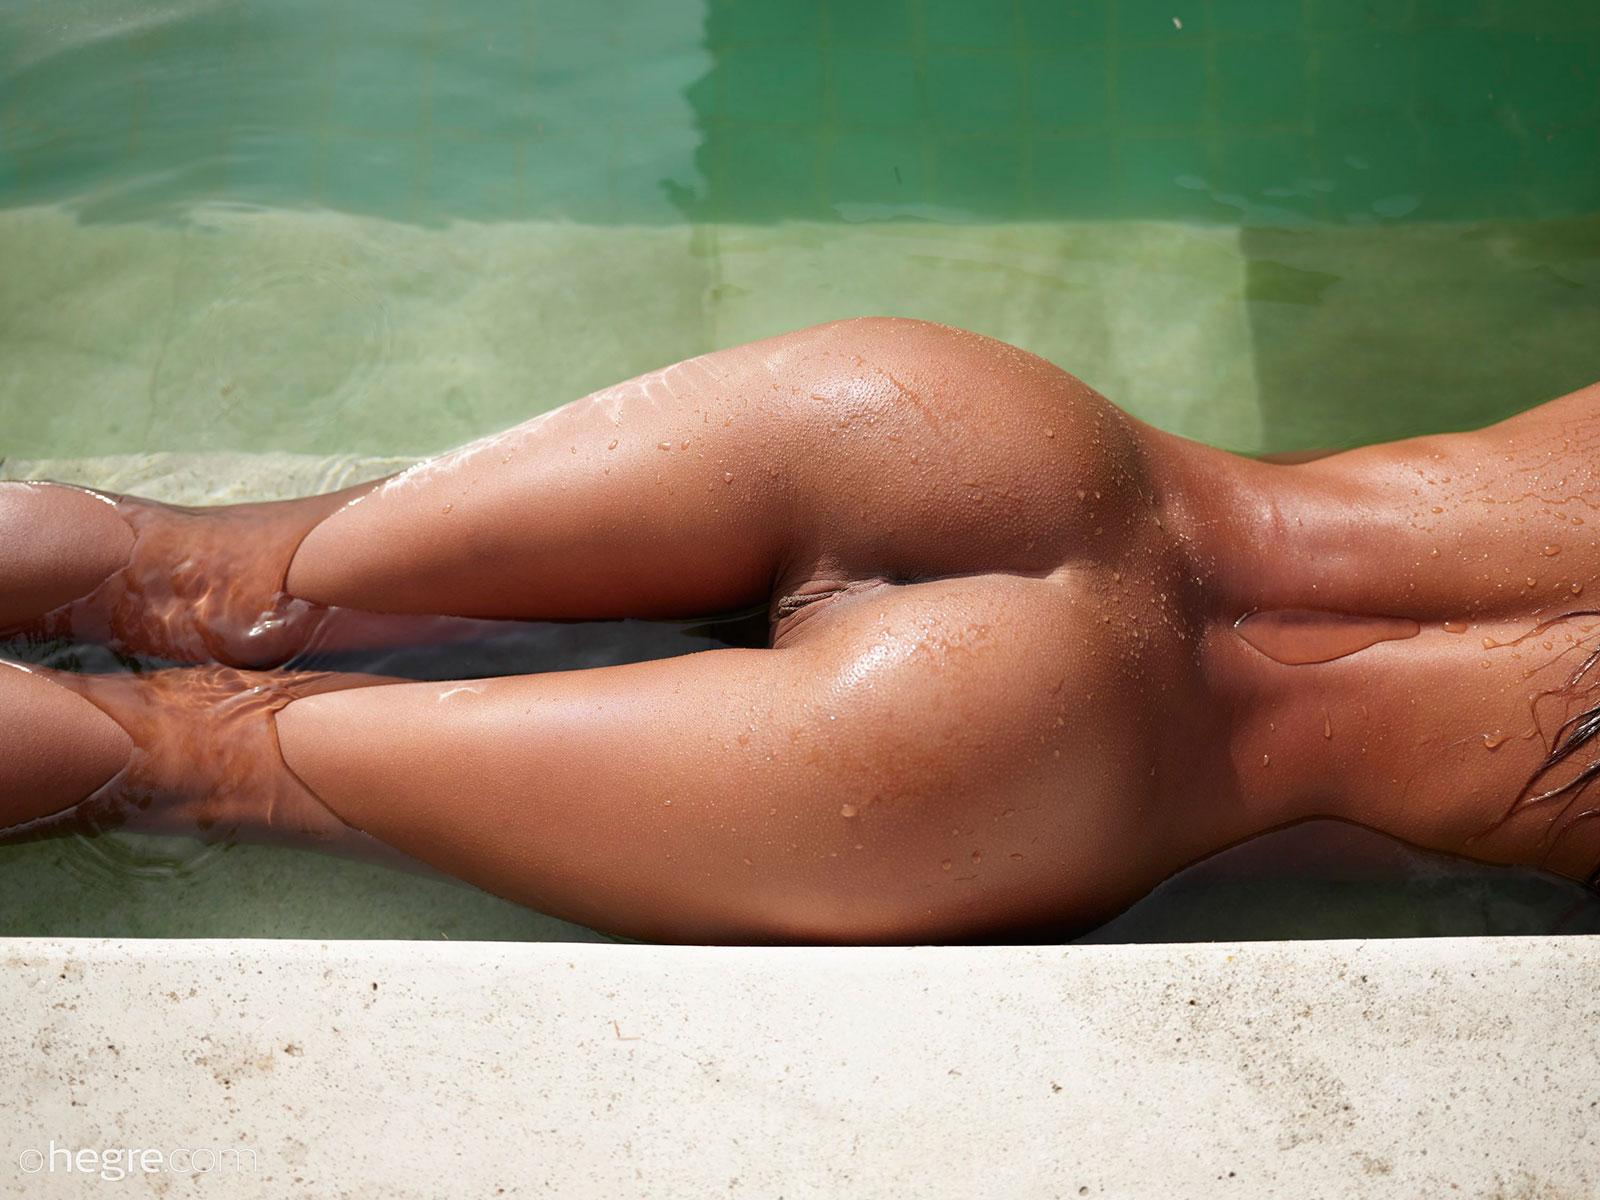 Femme Fontaine En Plein Orgasme Top Hot Video -5050